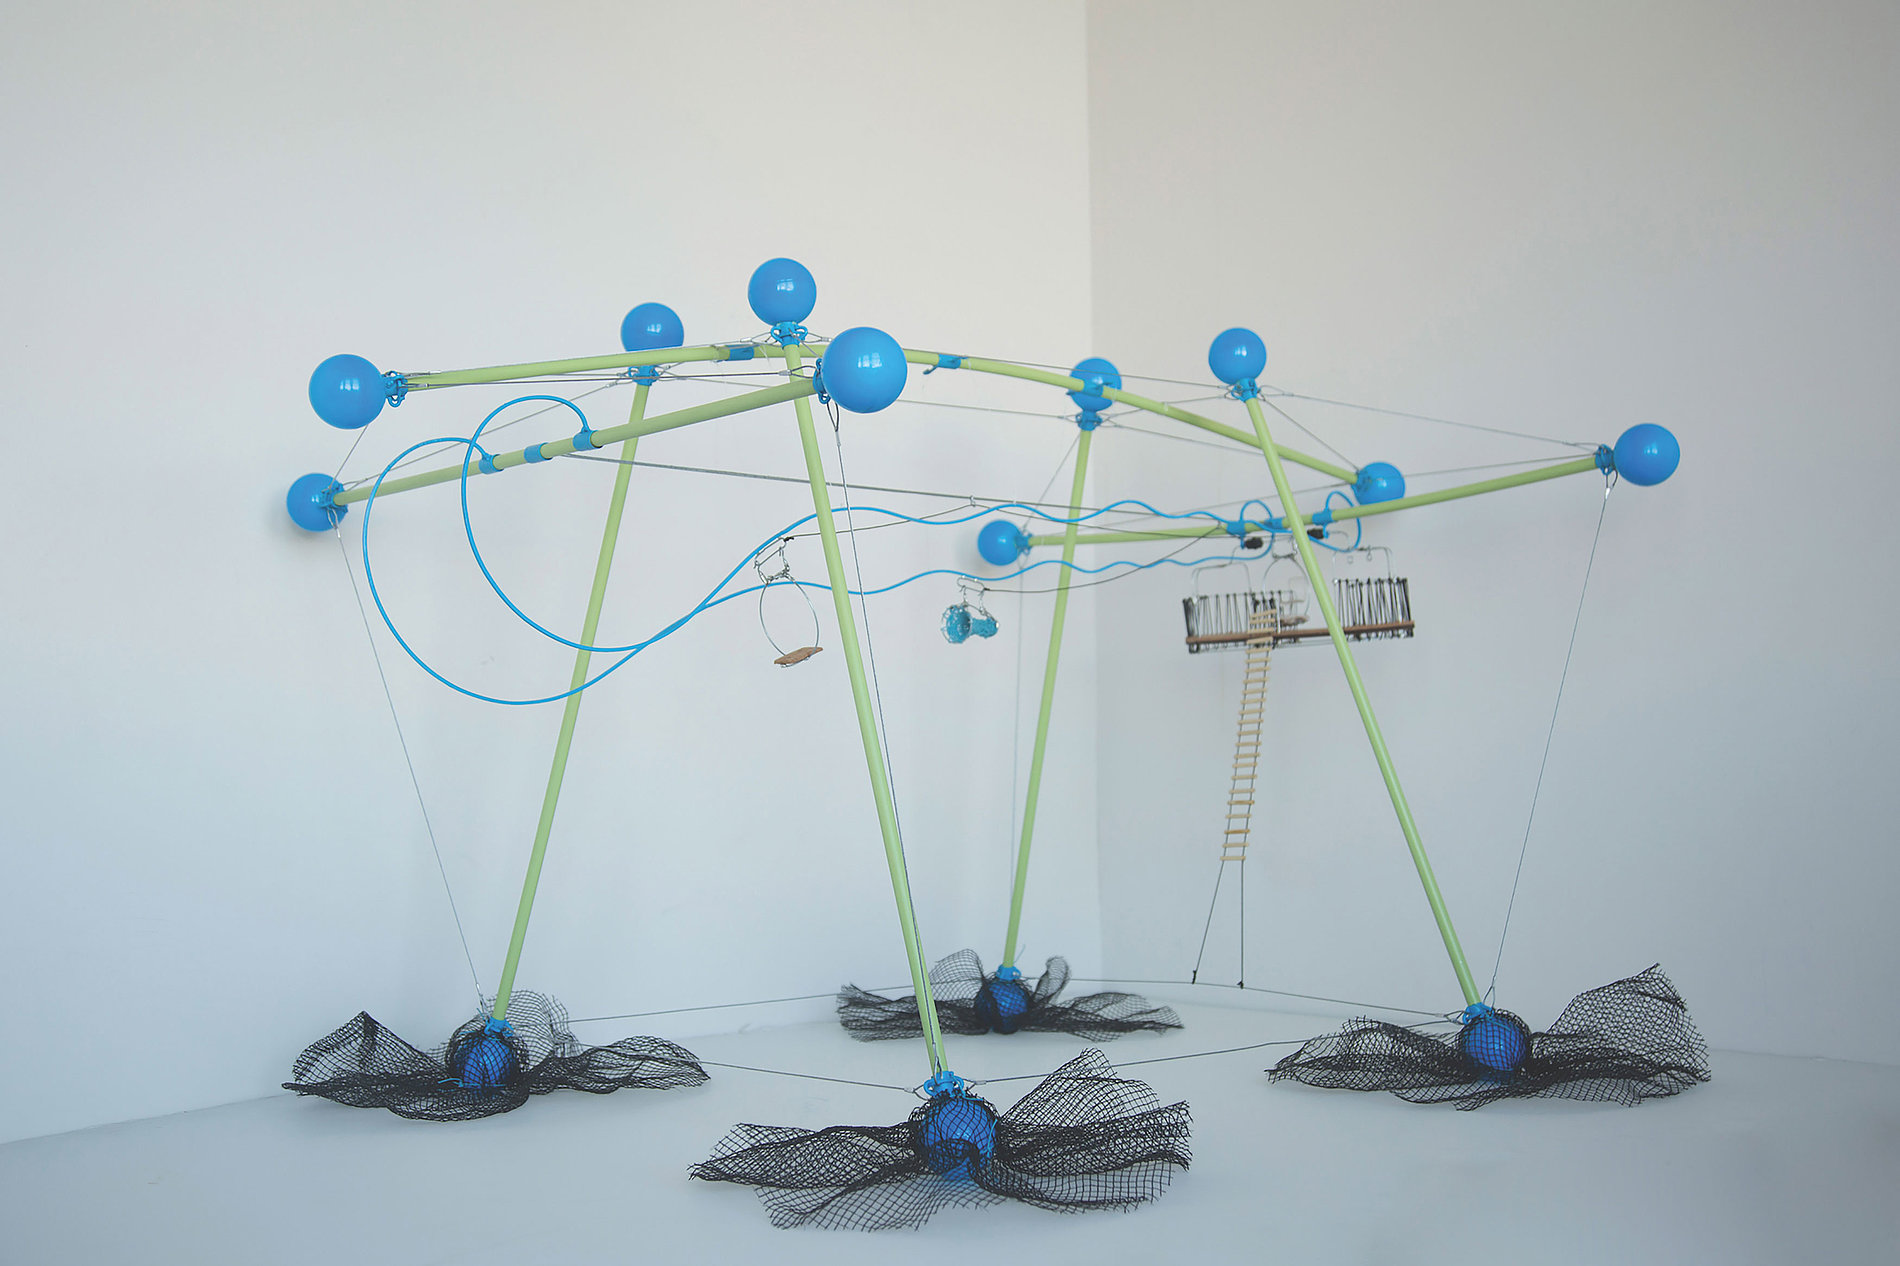 Wiggle Theory Kinesthetic Design for Balance and Movement | Red Dot Design Award